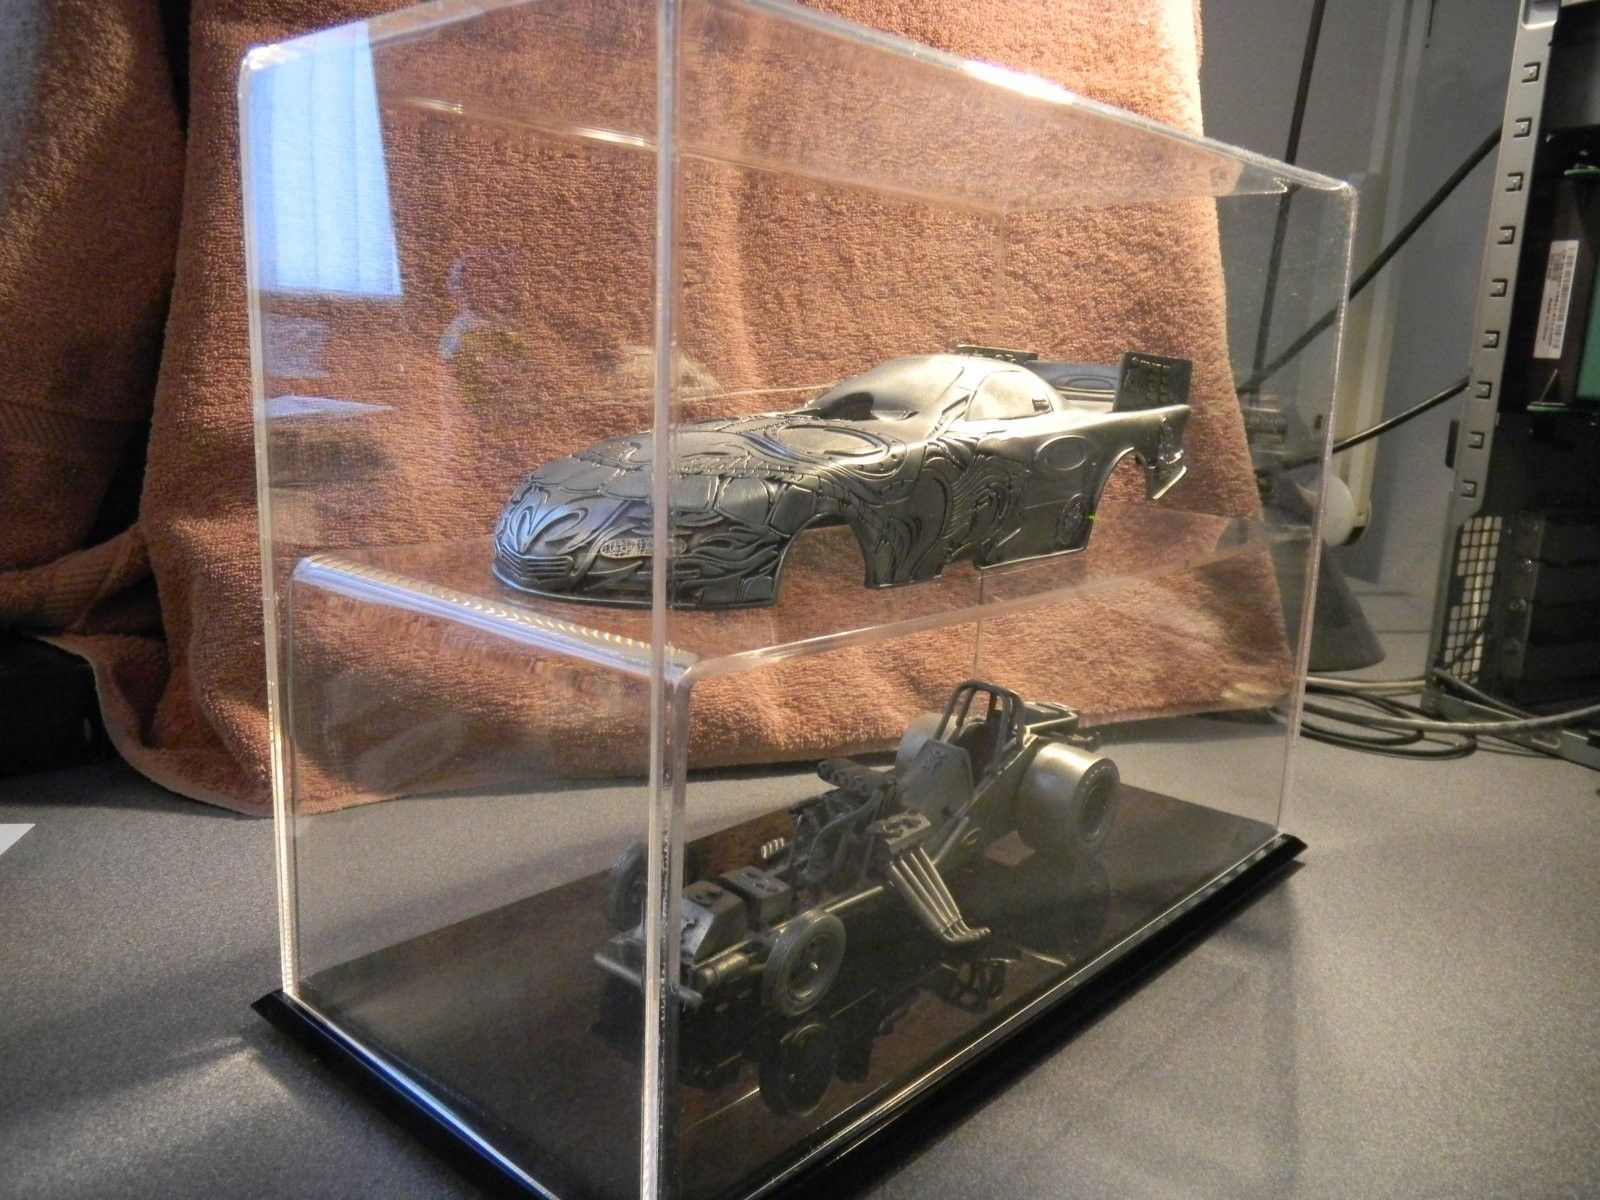 Scotty Cannon PEWTER Funny Car - DSCN1870.JPG